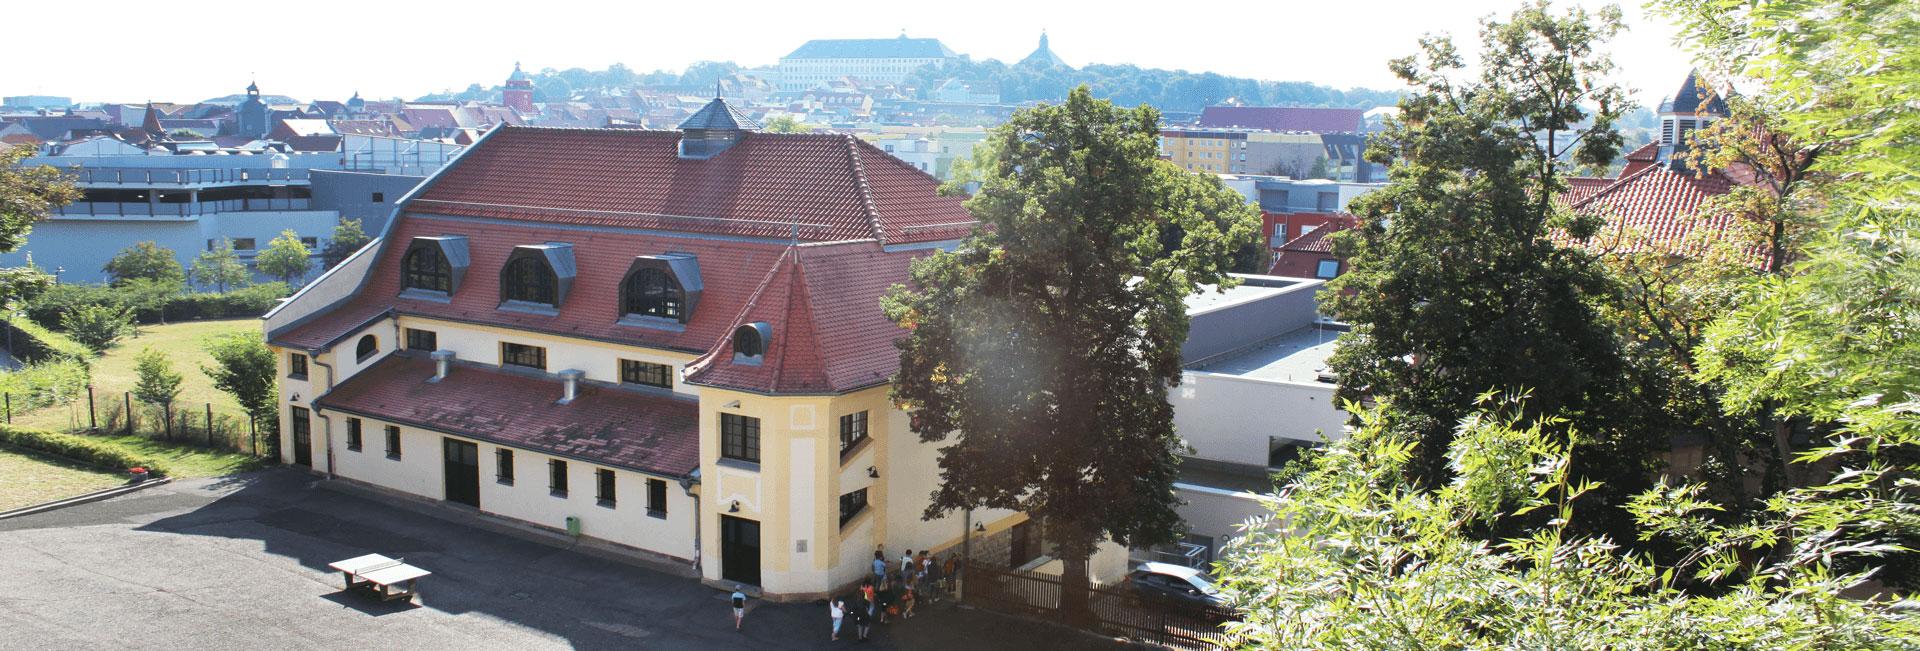 http://www.arnoldi-gym.de/wp-content/uploads/2016/09/schule-header-arnoldi3.jpg